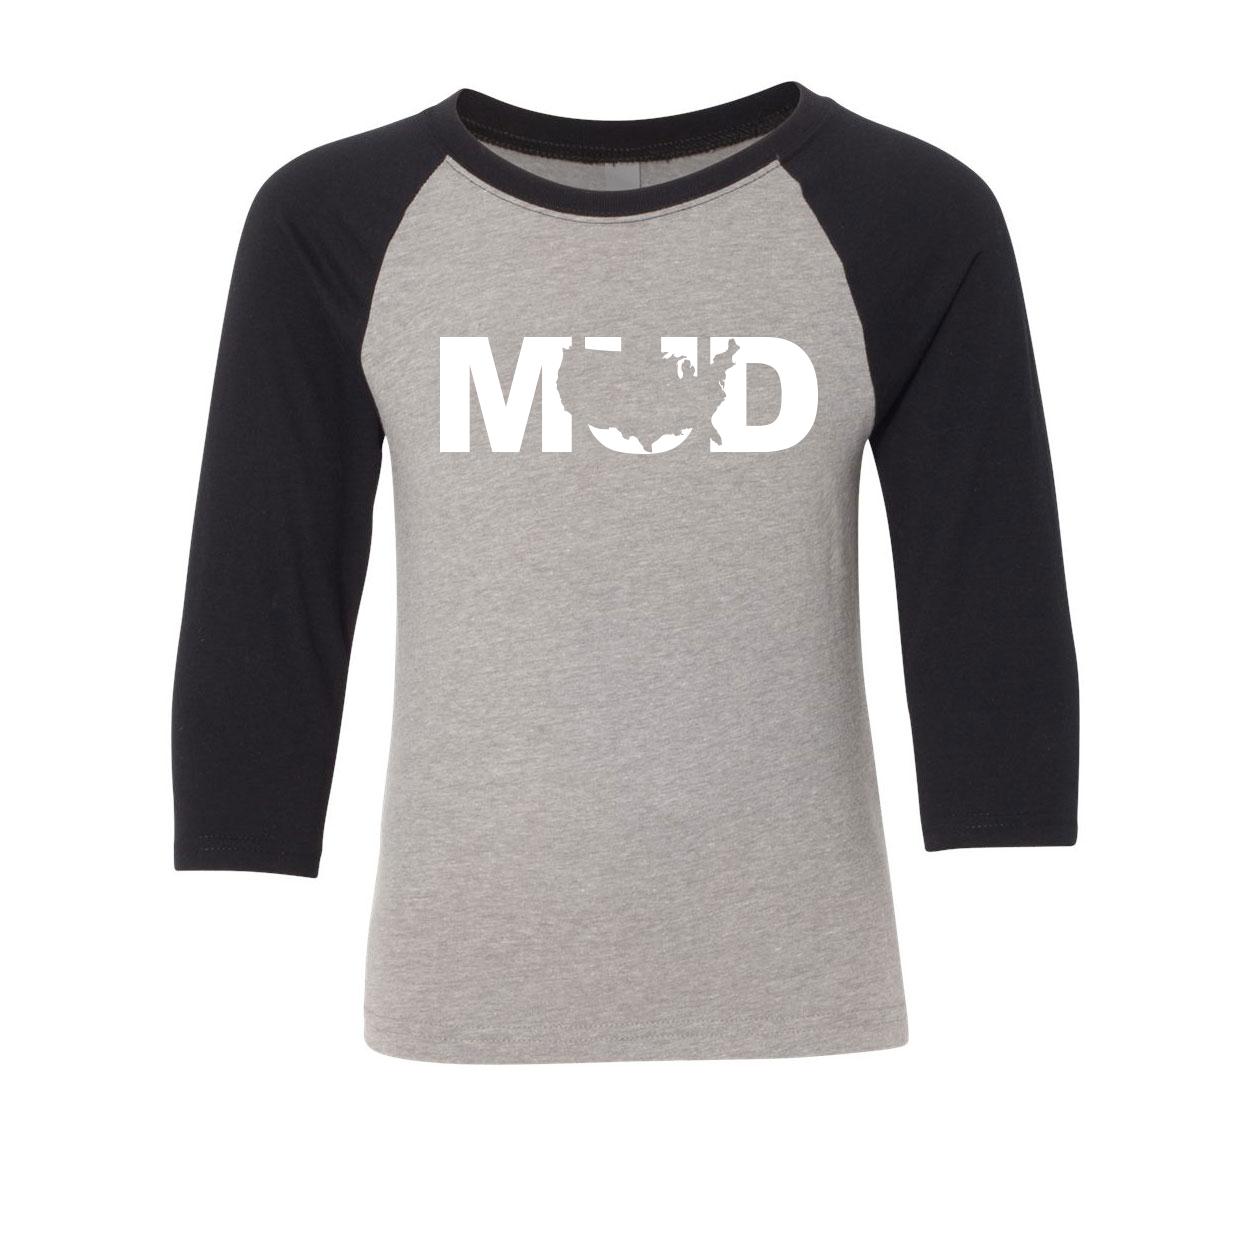 Mud United States Classic Youth Premium Raglan Shirt Gray/Black (White Logo)